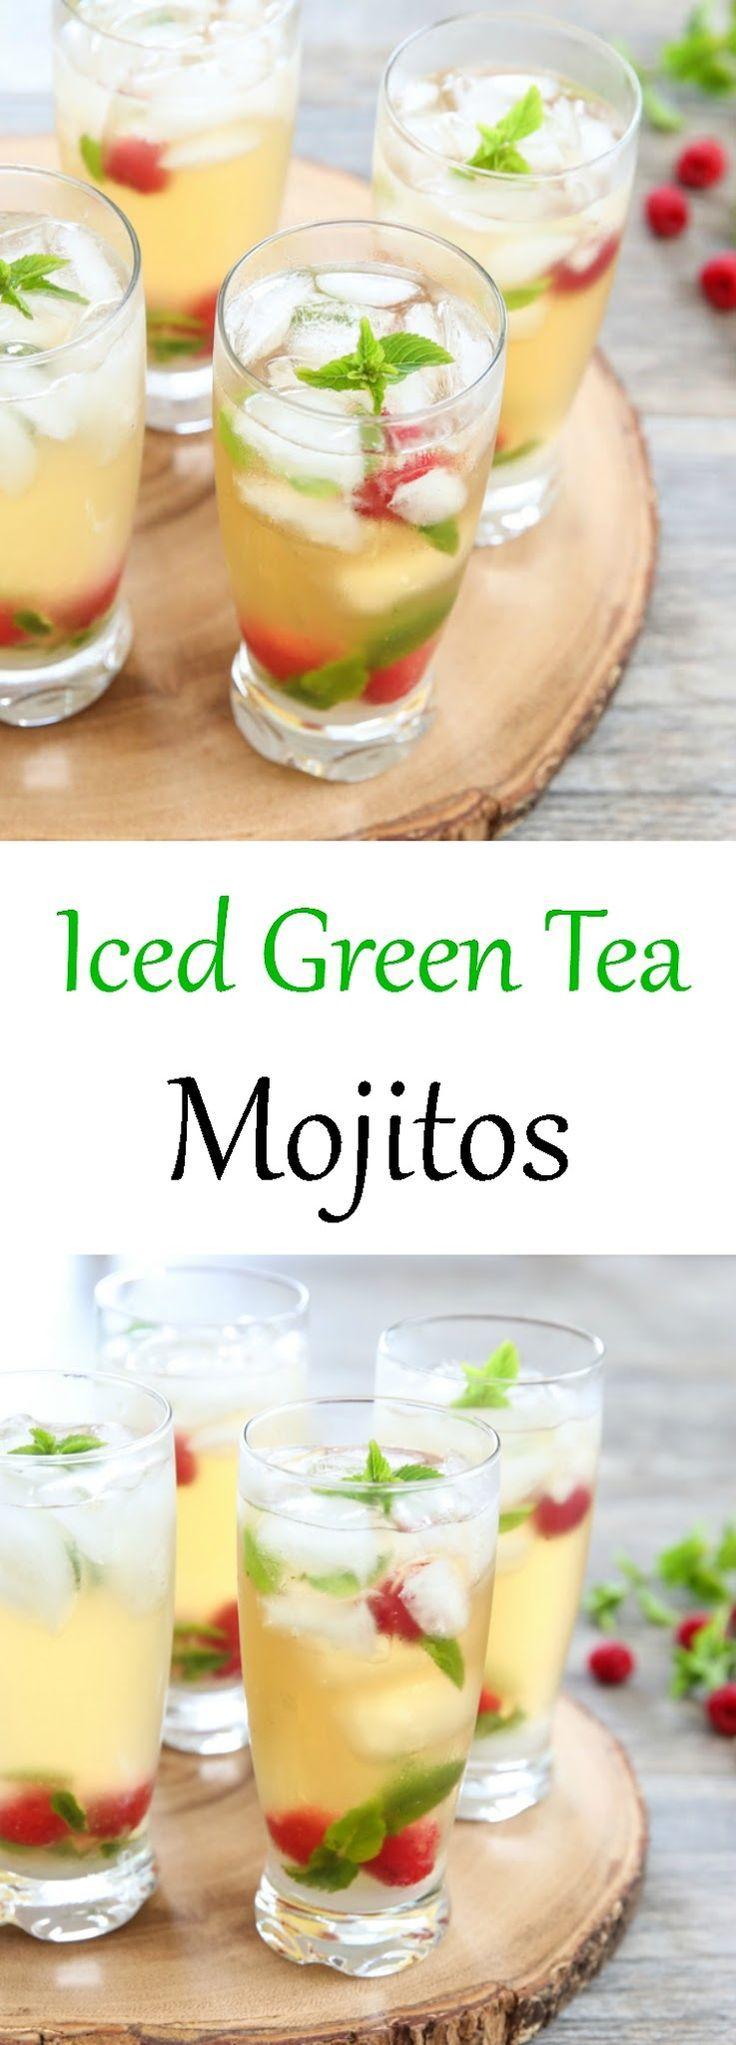 Iced Green Tea Mojitos #cocktail